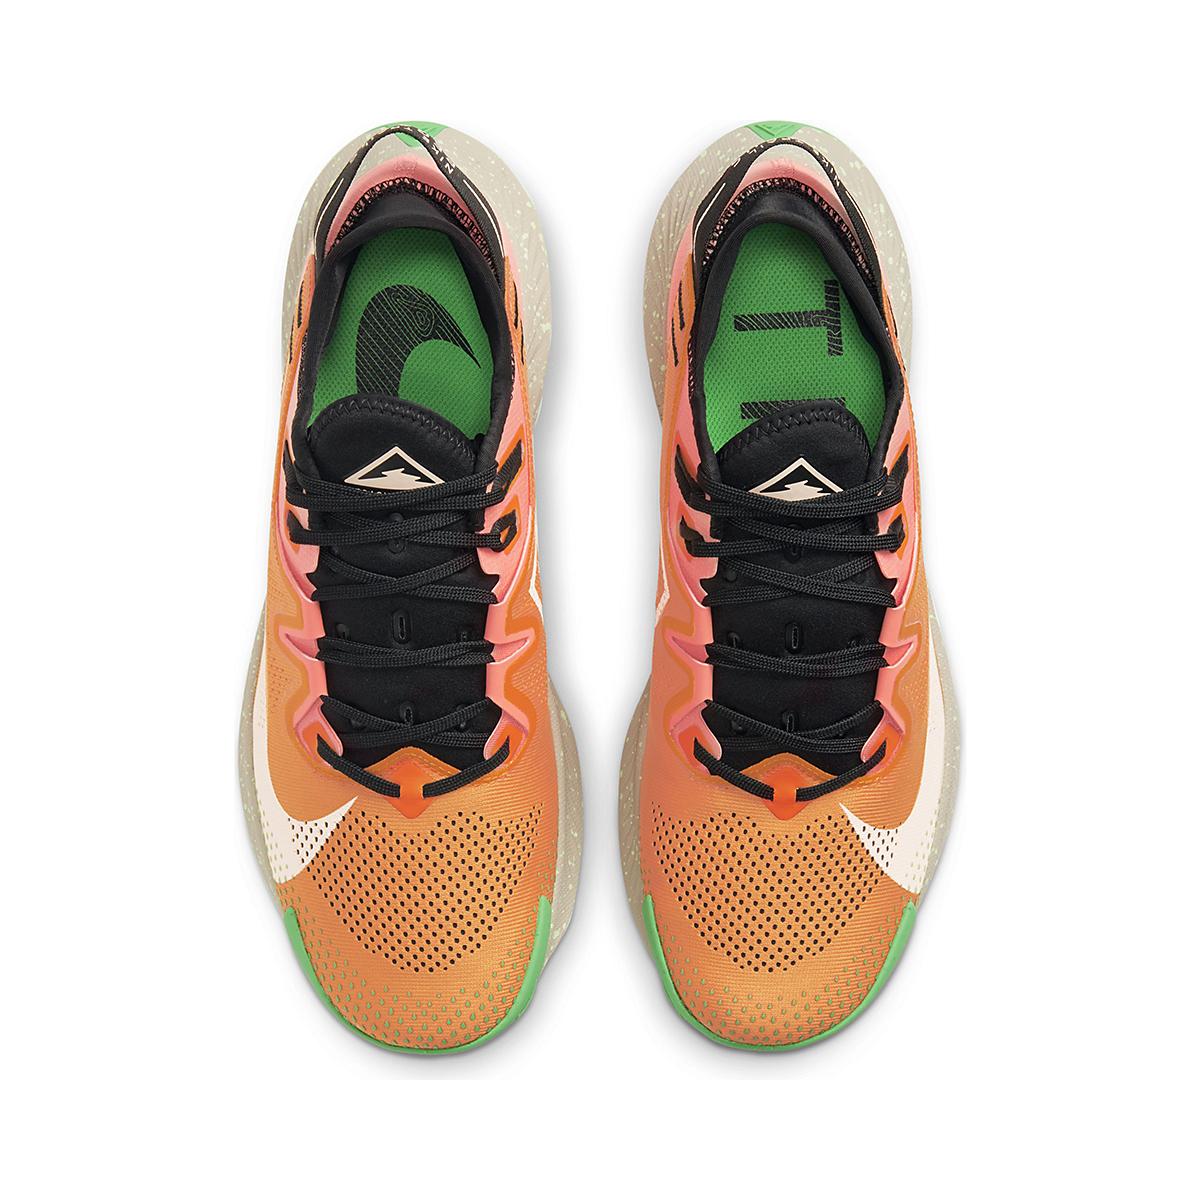 Men's Nike Pegasus Trail 2 Trail Running Shoe - Color: Kumquat/Crimson - Size: 6 - Width: Regular, Kumquat/Crimson, large, image 4